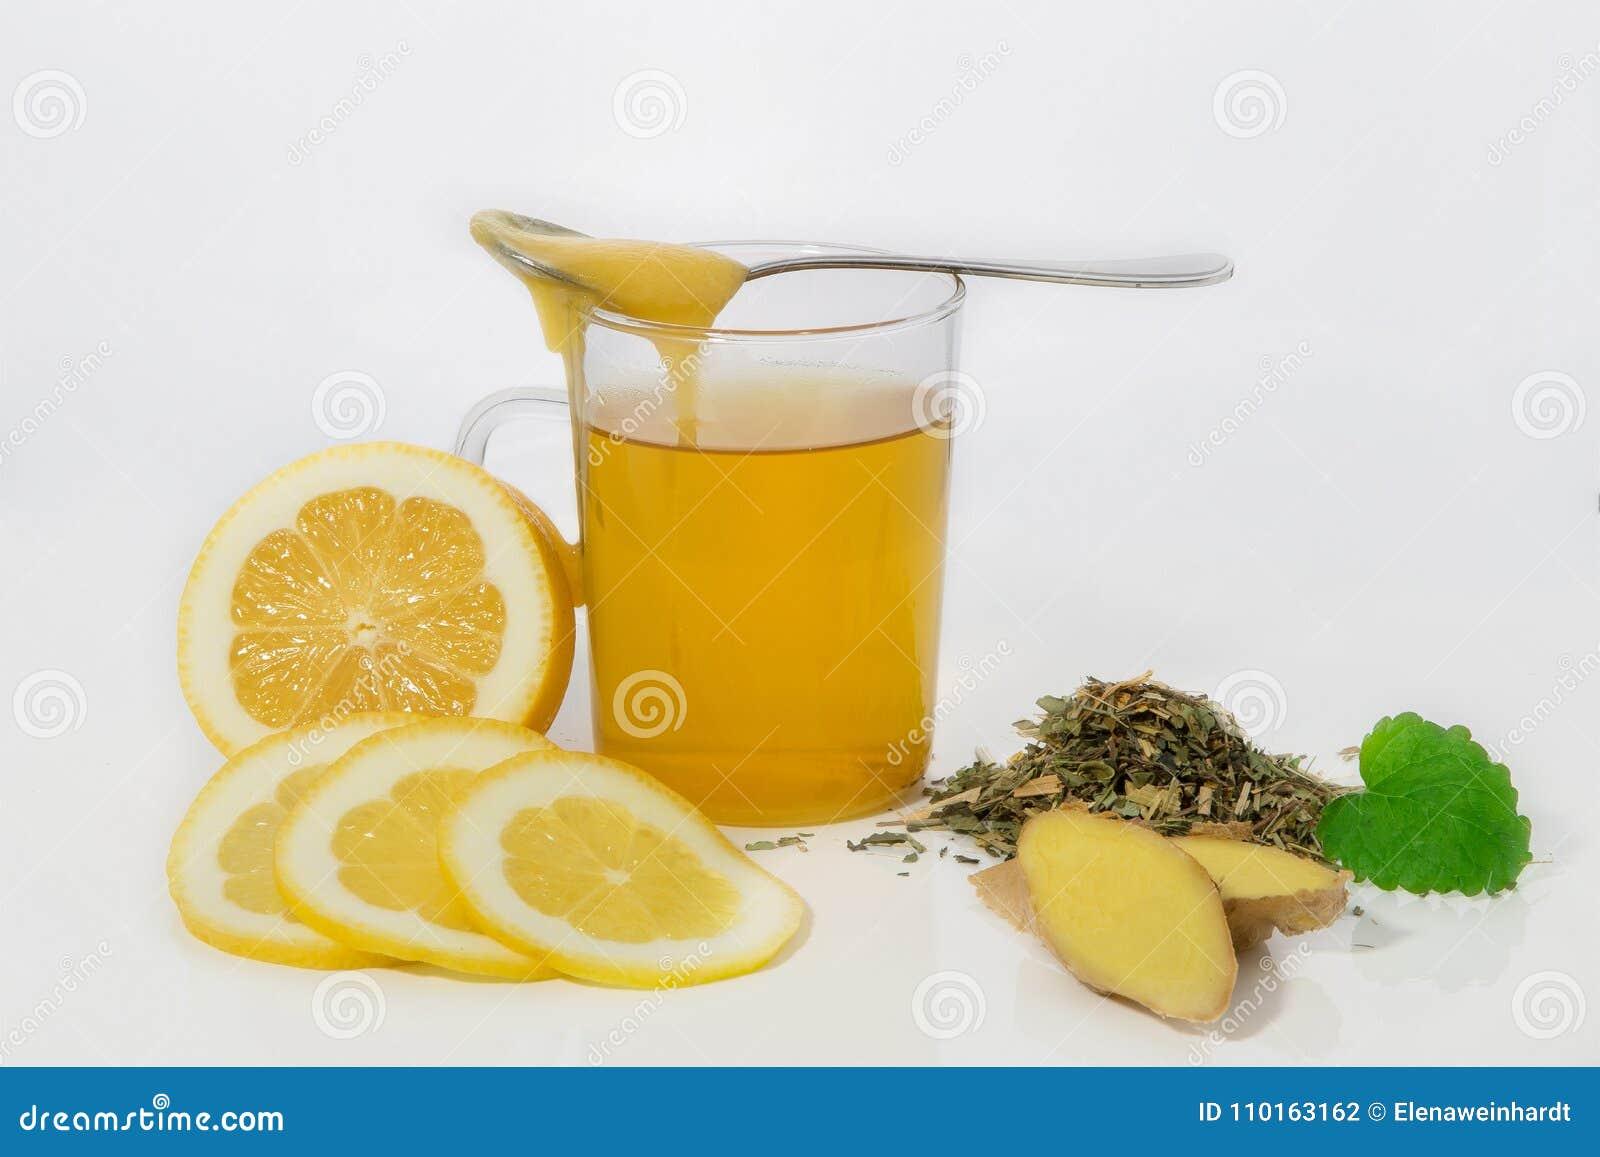 Is tea useful? 7